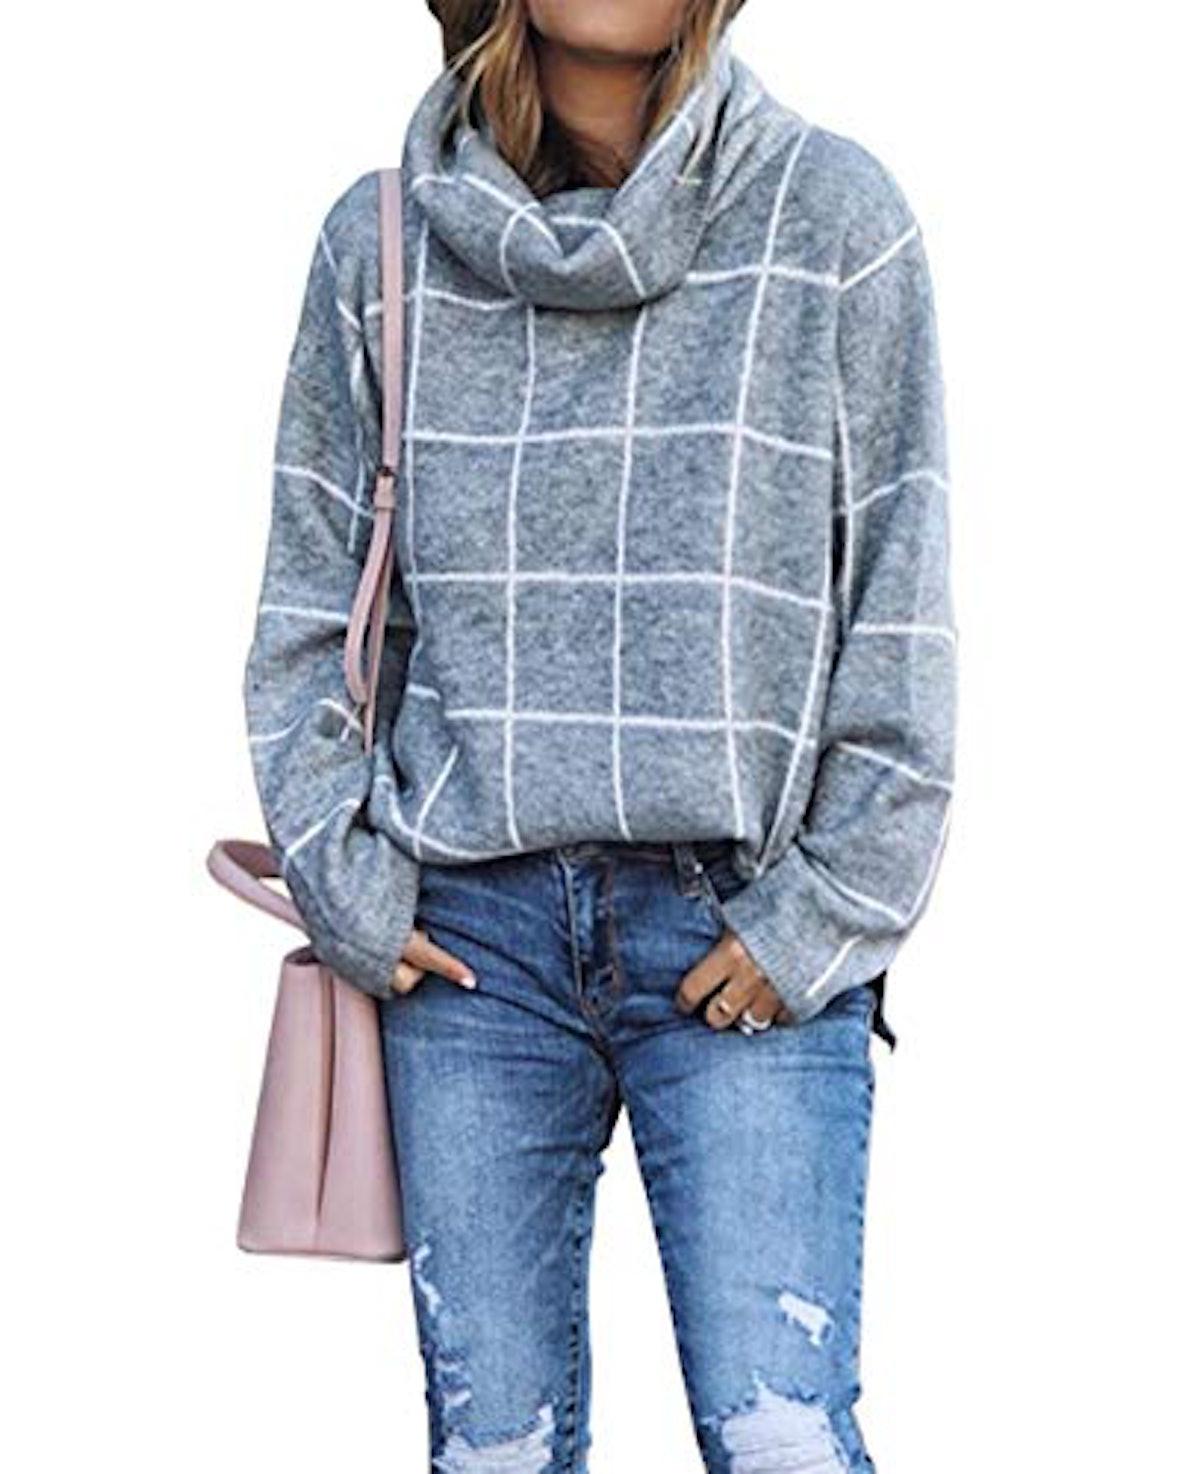 KIRUNDO Checked Turtleneck Pullover